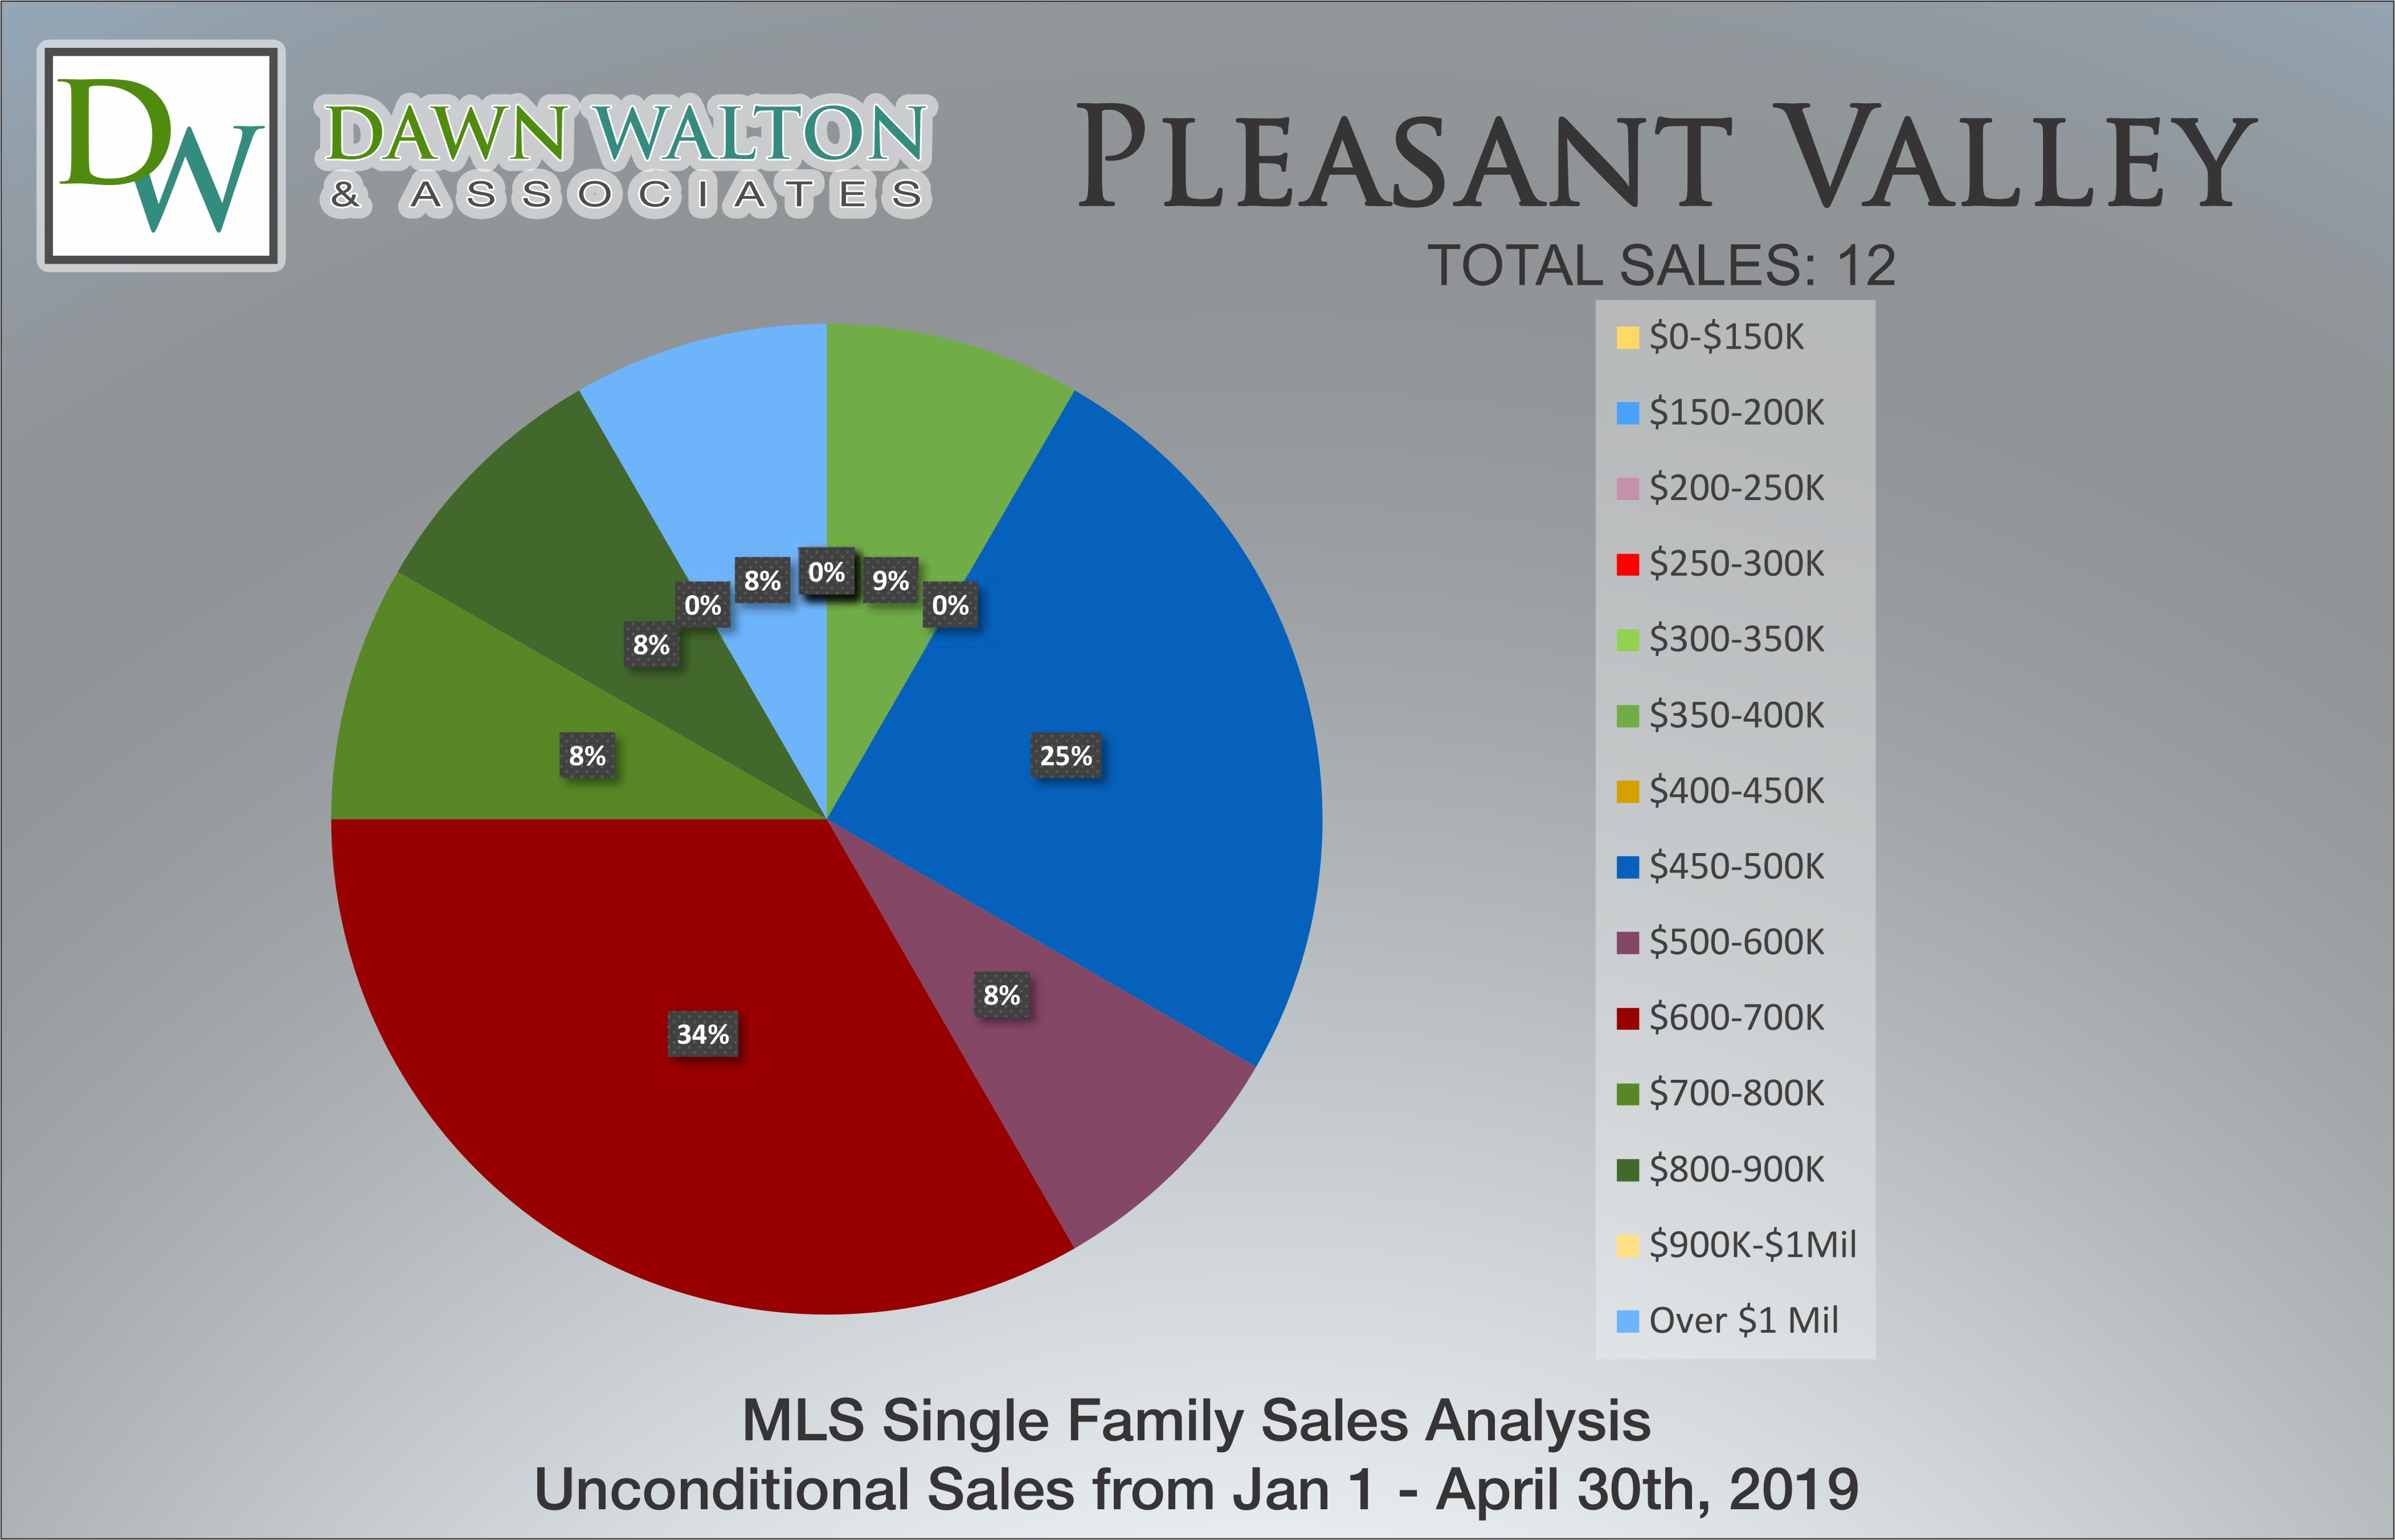 Pleasant Valley Real Estate Market Stats Price Percentage Jan 1 - April 30, 2019 - Nanaimo Realtor Dawn Walton